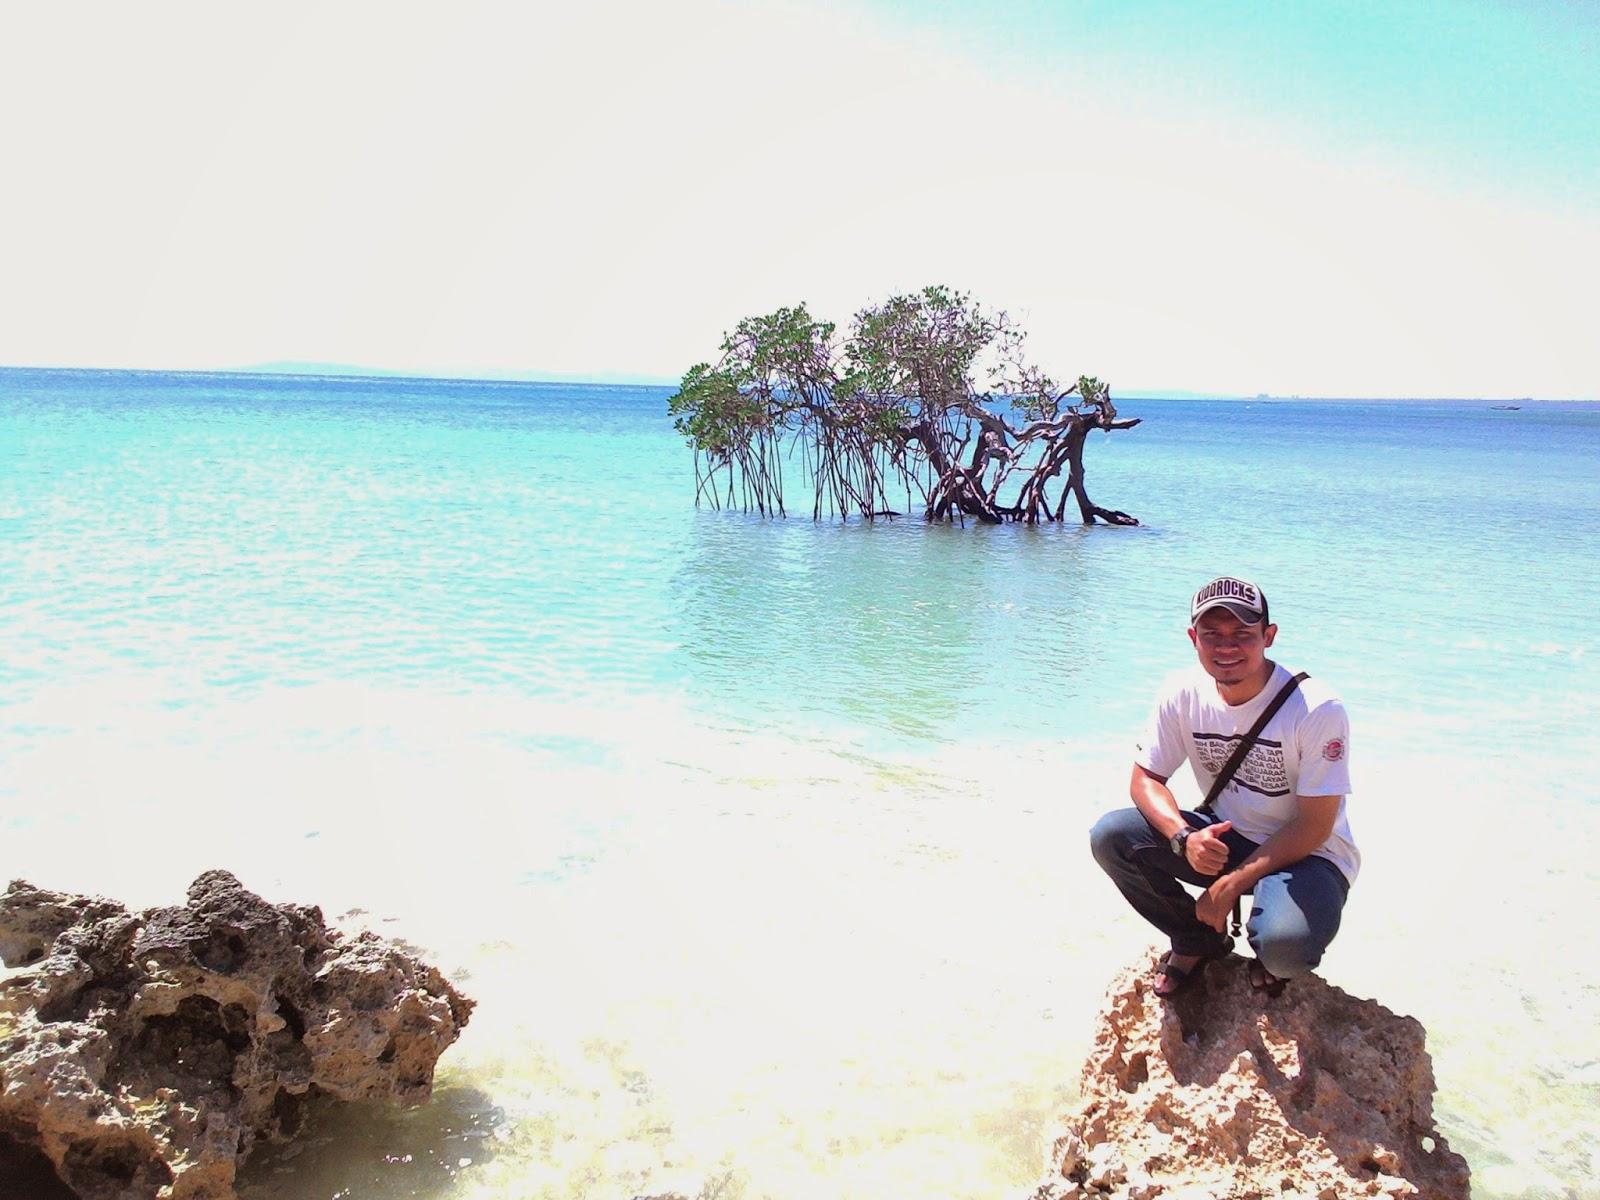 Coretan Lion Explore Wisata Kupang Ntt Tablolong Oenesu Oehala Pantai